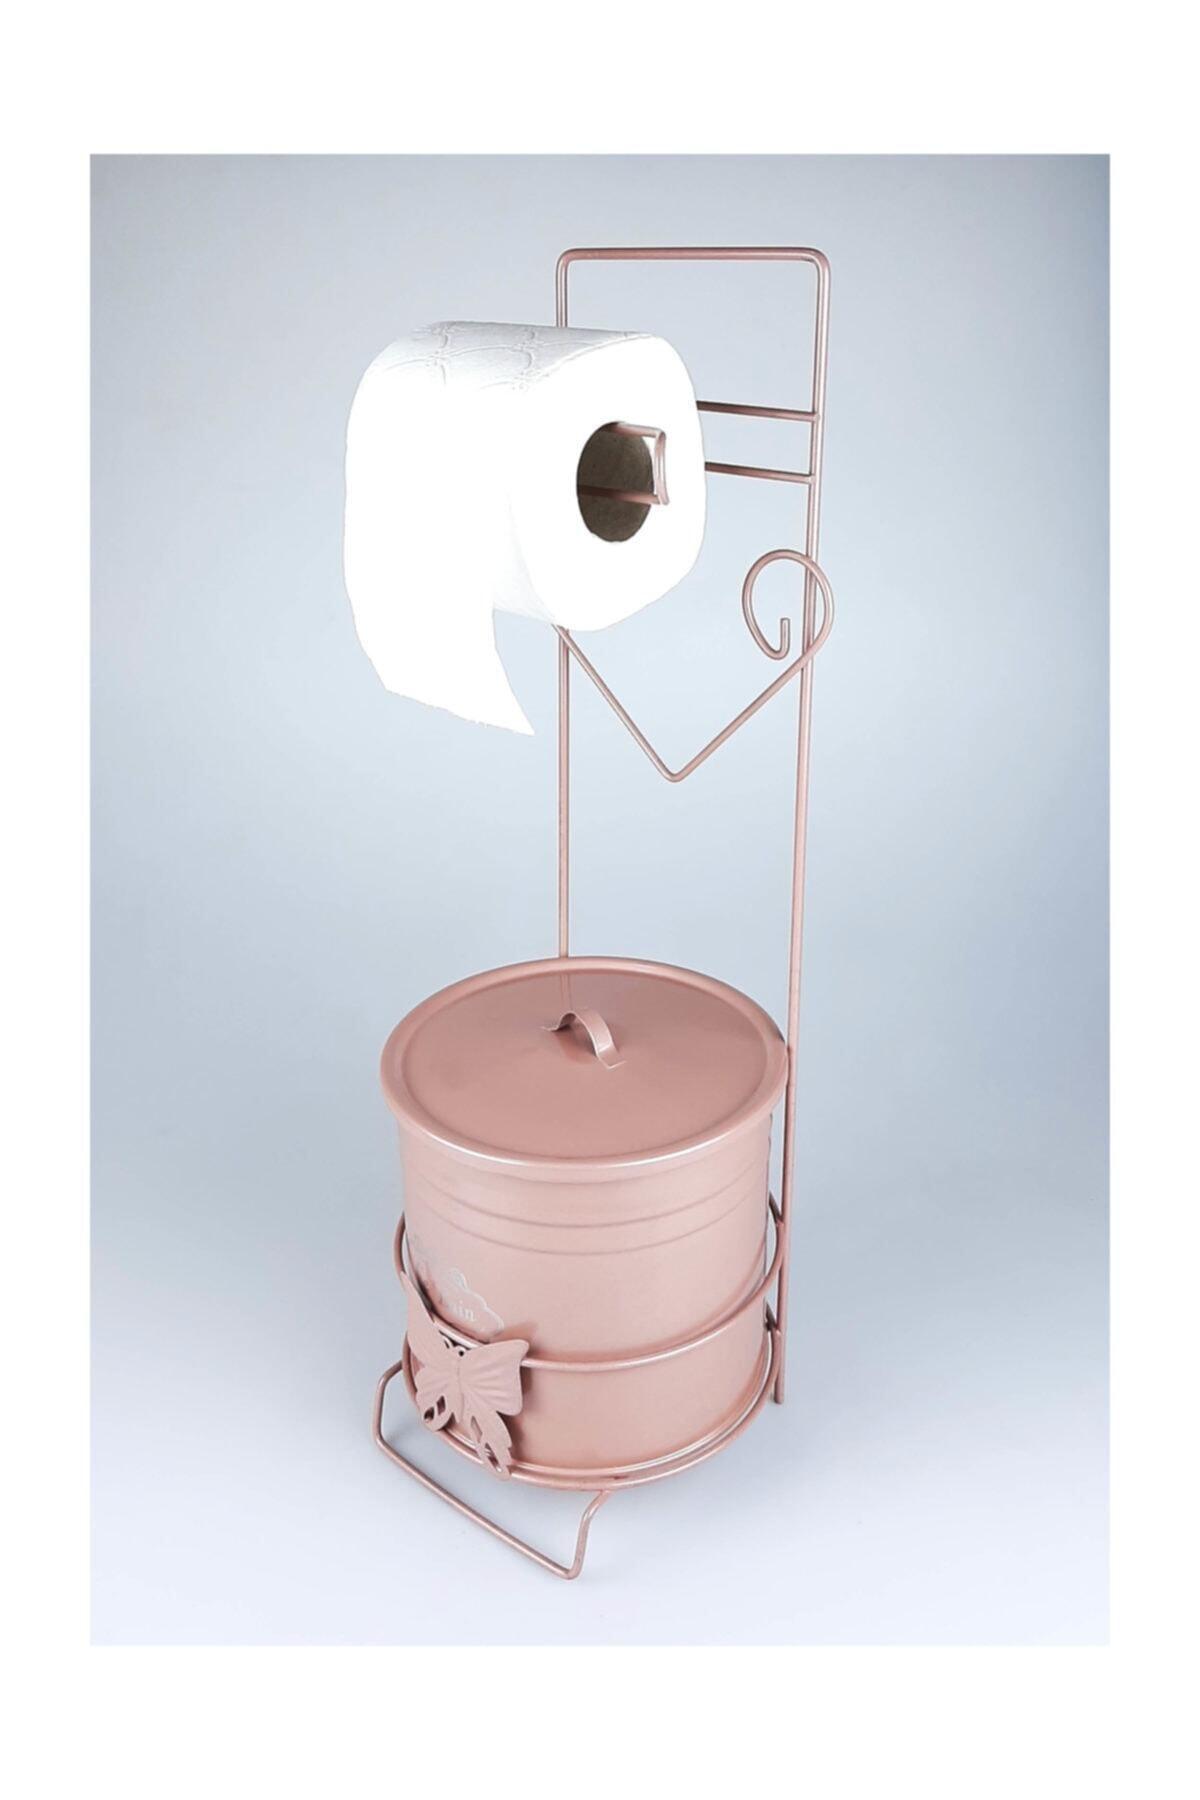 Trend Tuvalet Kağıtlığı Ve Çöp Kovası